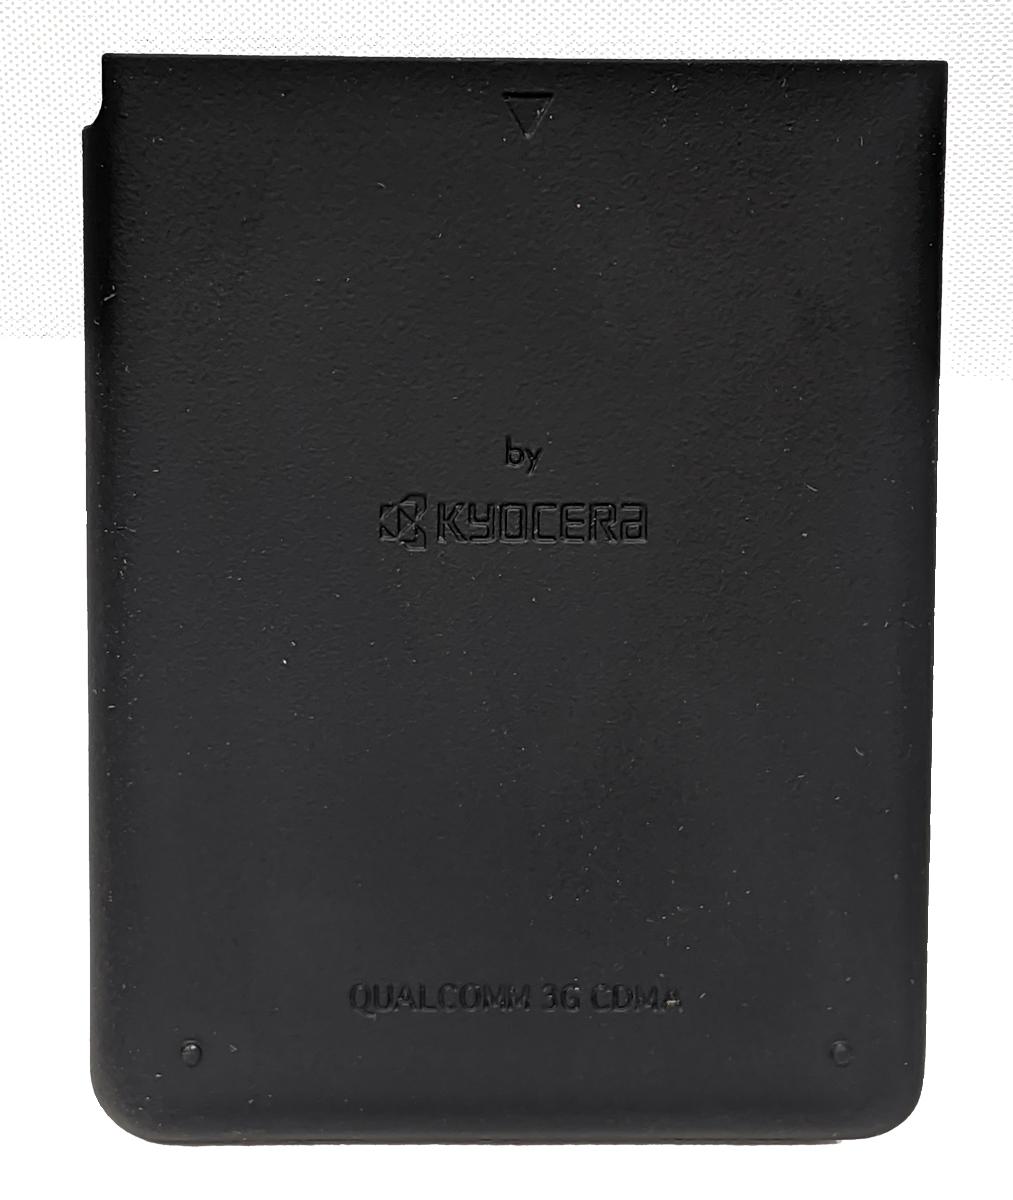 OEM Kyocera Replacement SCP-6780 Innuendo Battery Door